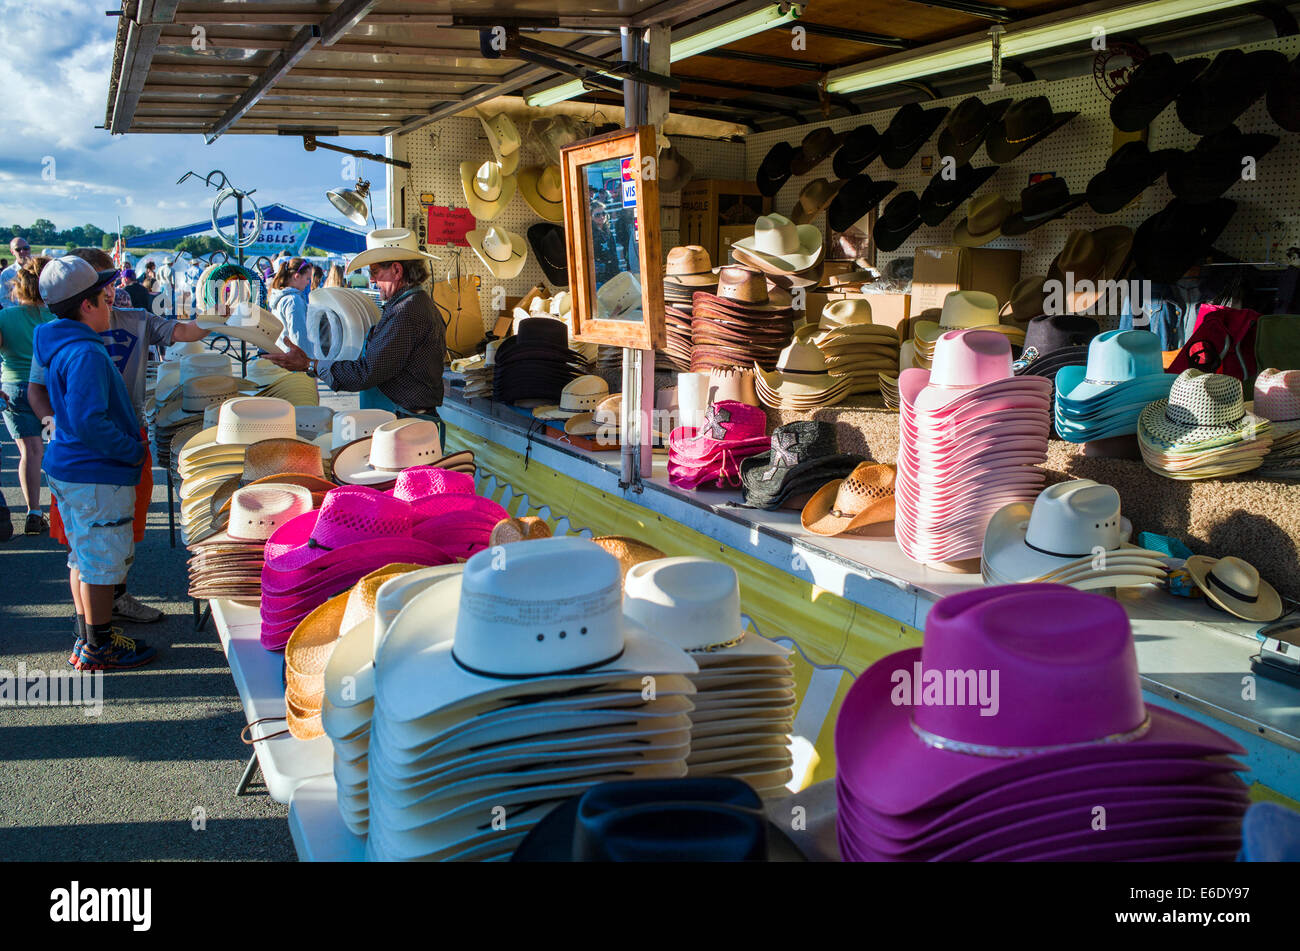 Visitors buying cowboy hats, Chaffee County Fair, Colorado, USA - Stock Image